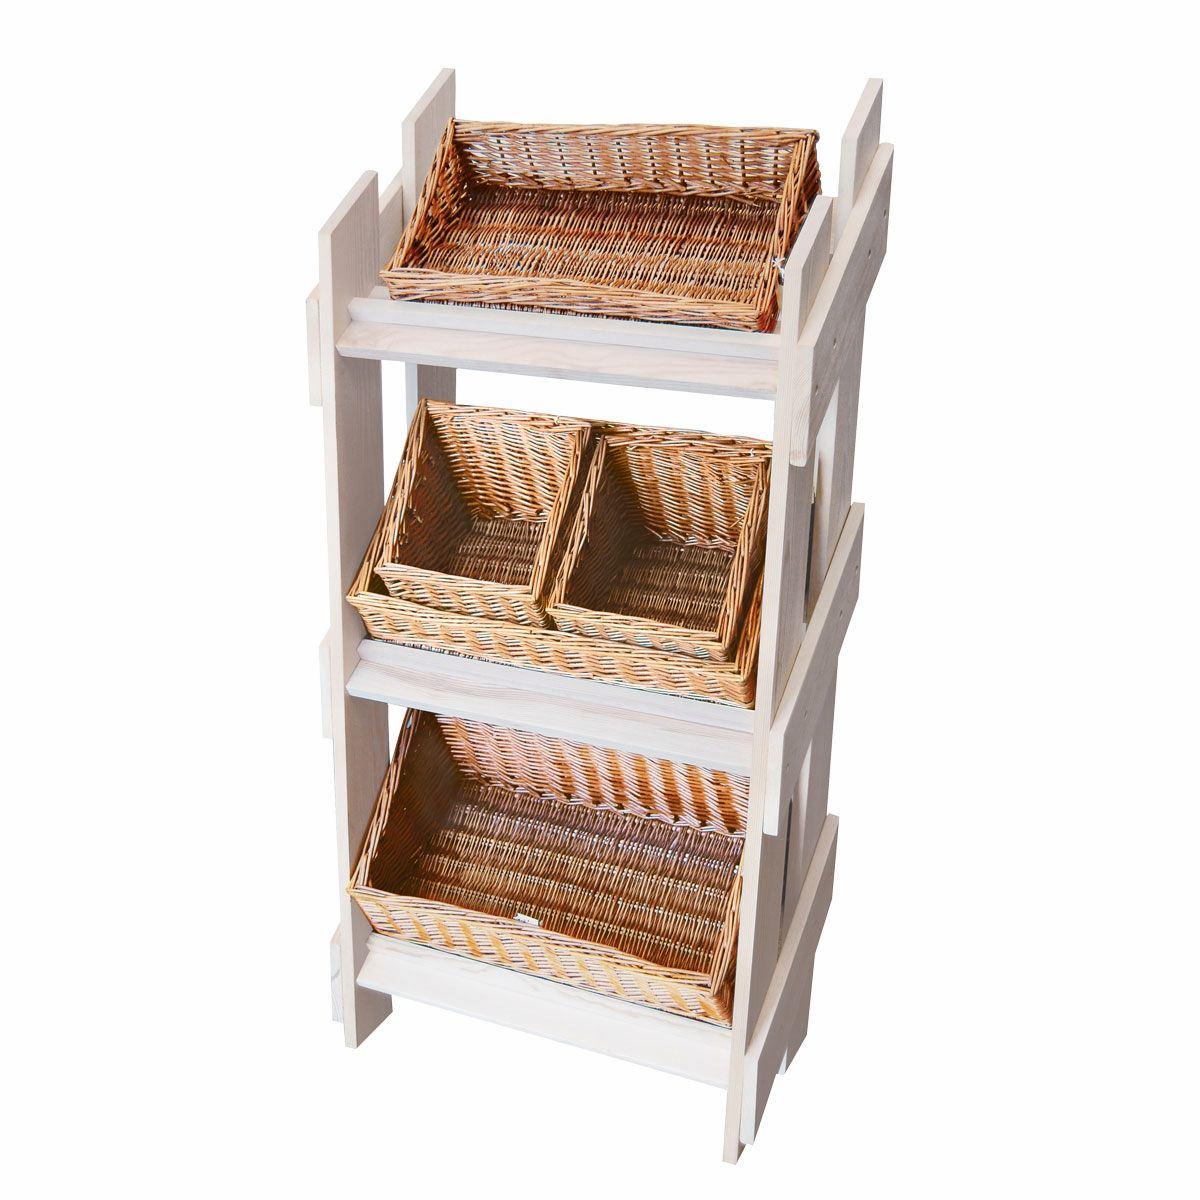 Cester a y muebles de mimbre artesania mimbre cesteria for Muebles con cestas